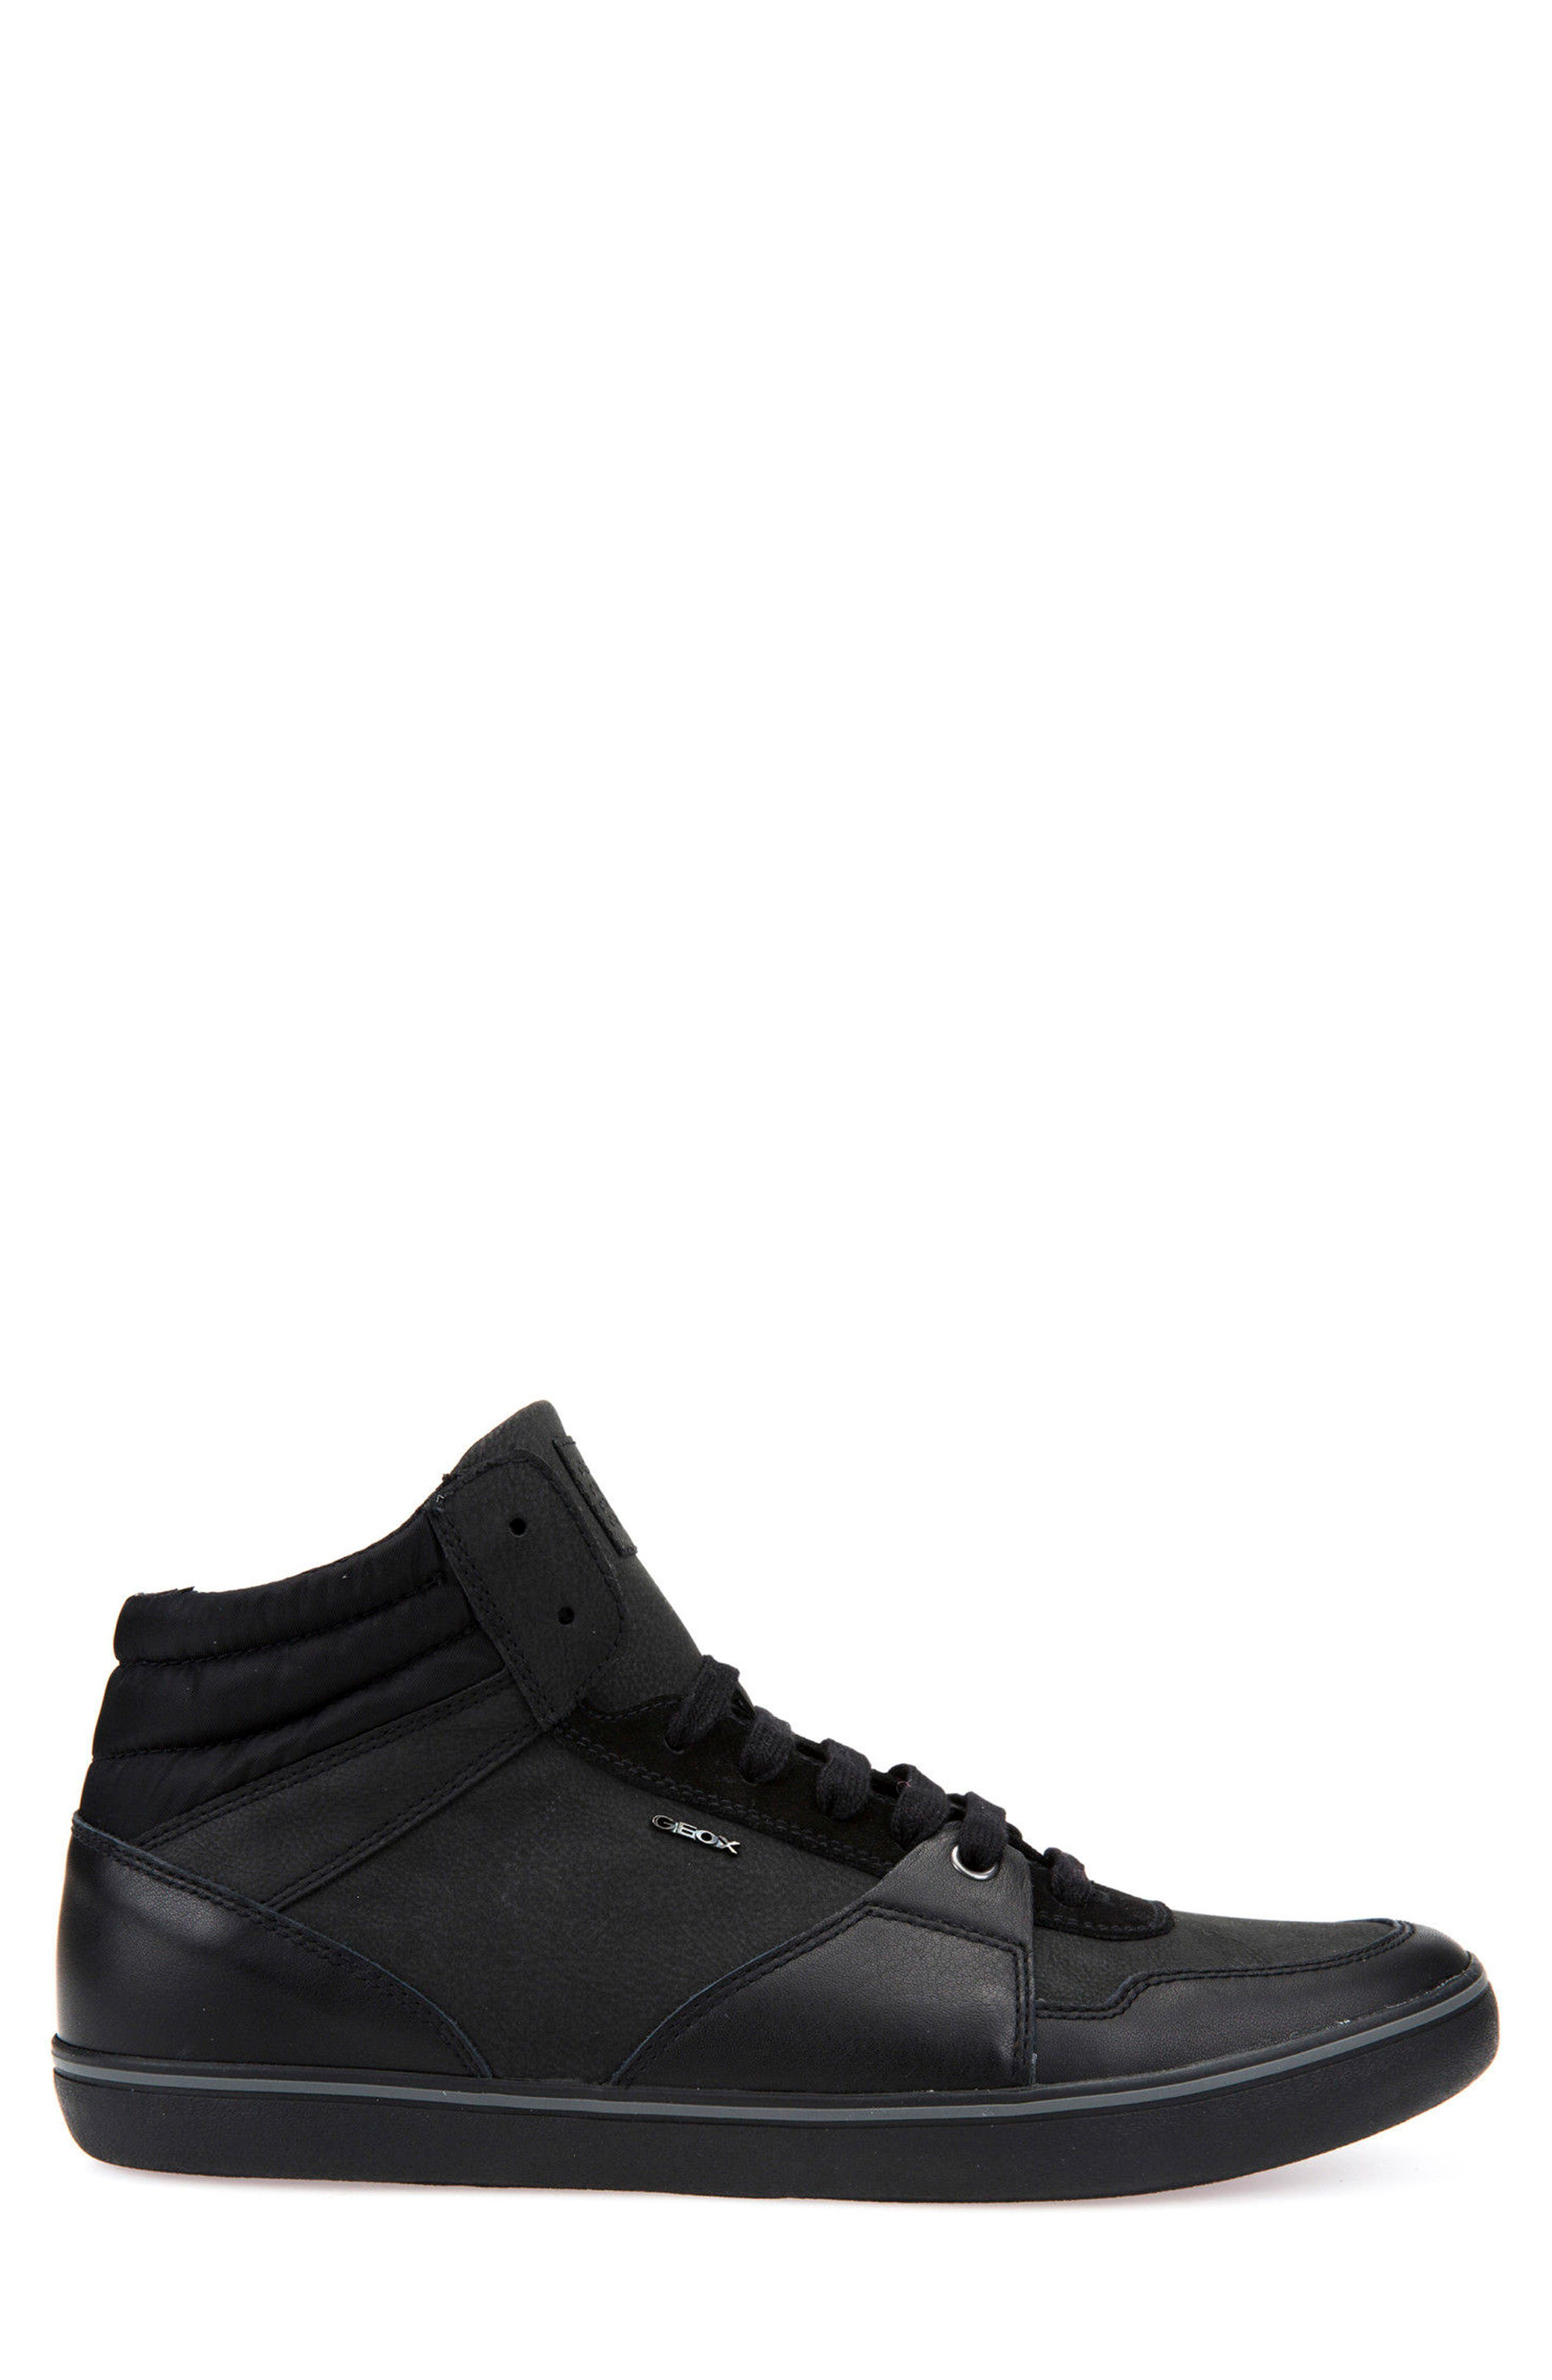 Box 31 High Top Sneaker,                             Alternate thumbnail 3, color,                             Black